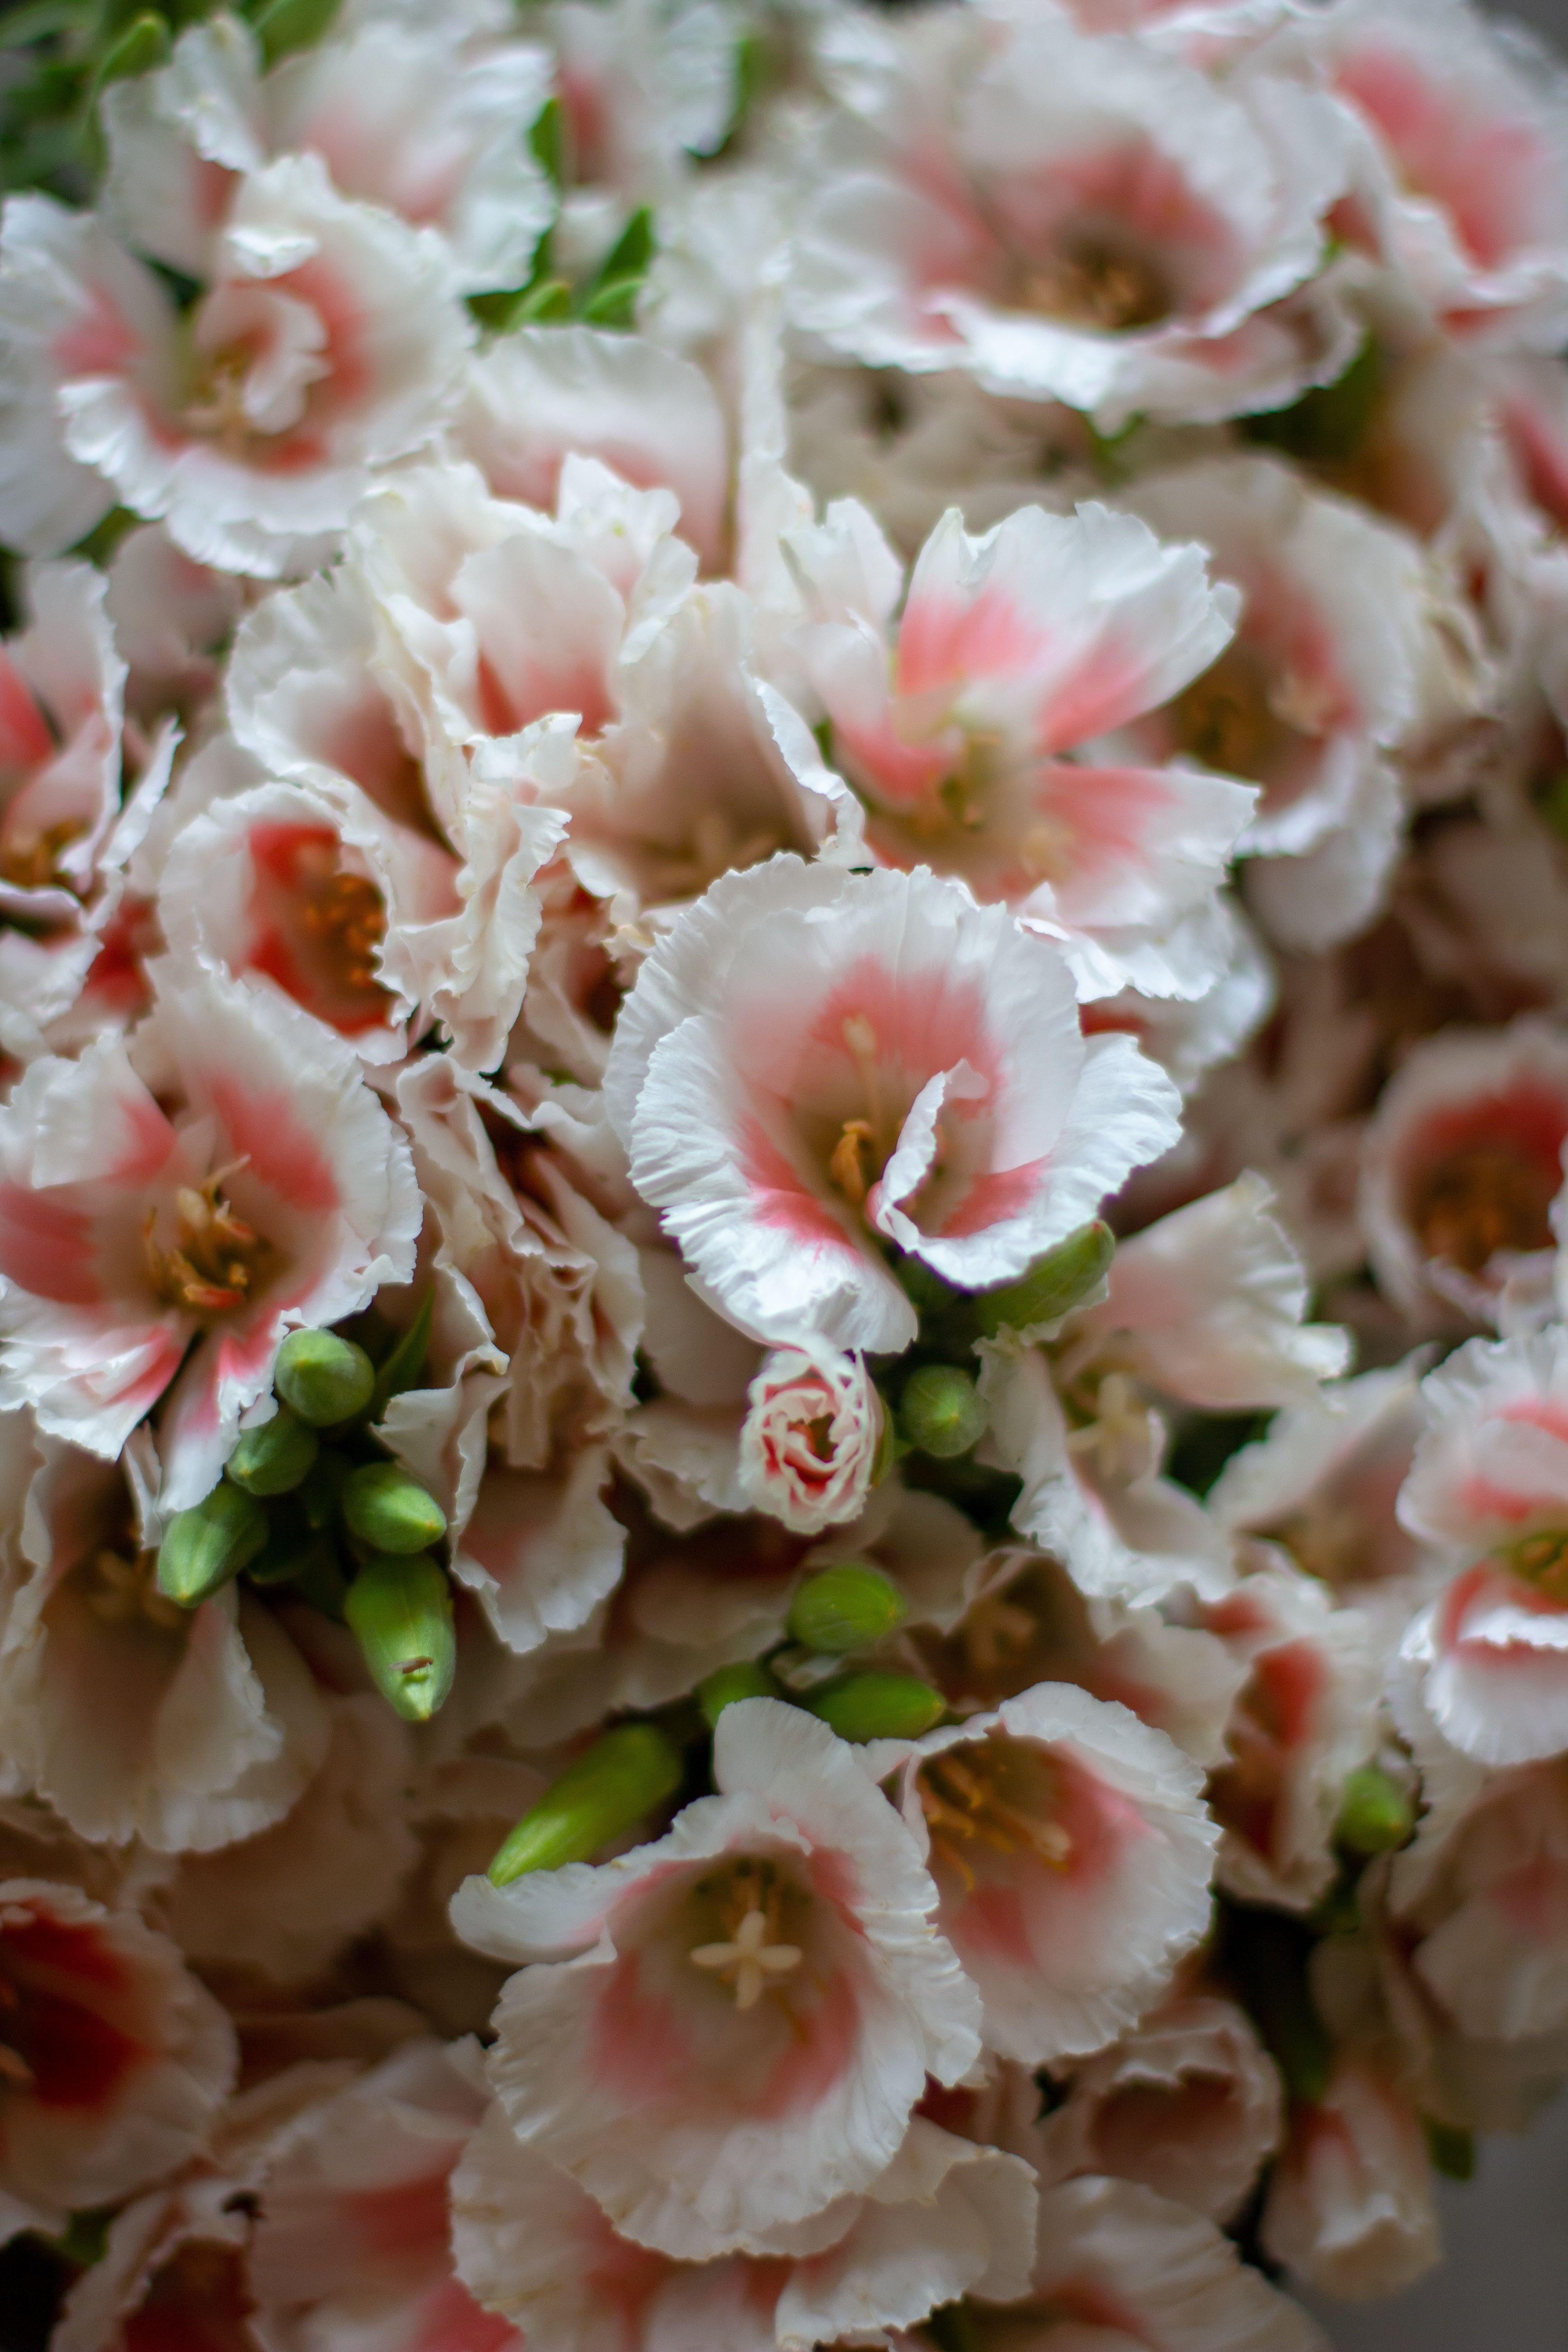 Flower Farm Love 'n Fresh Flowers (With images) Flower